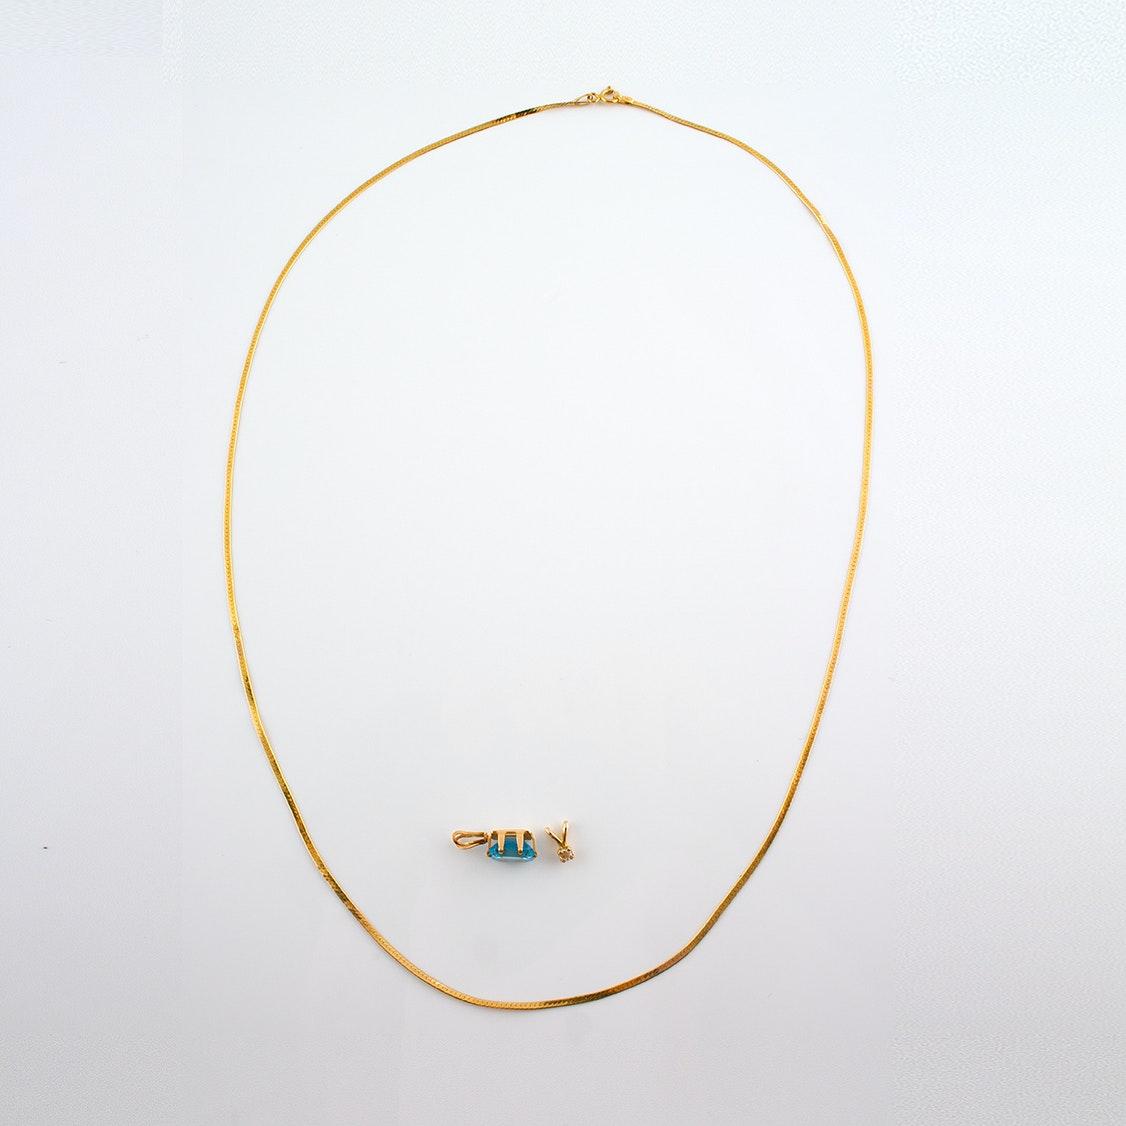 14K Gold Herringbone Chain with Diamond and Blue Cubic Zirconia Pendants